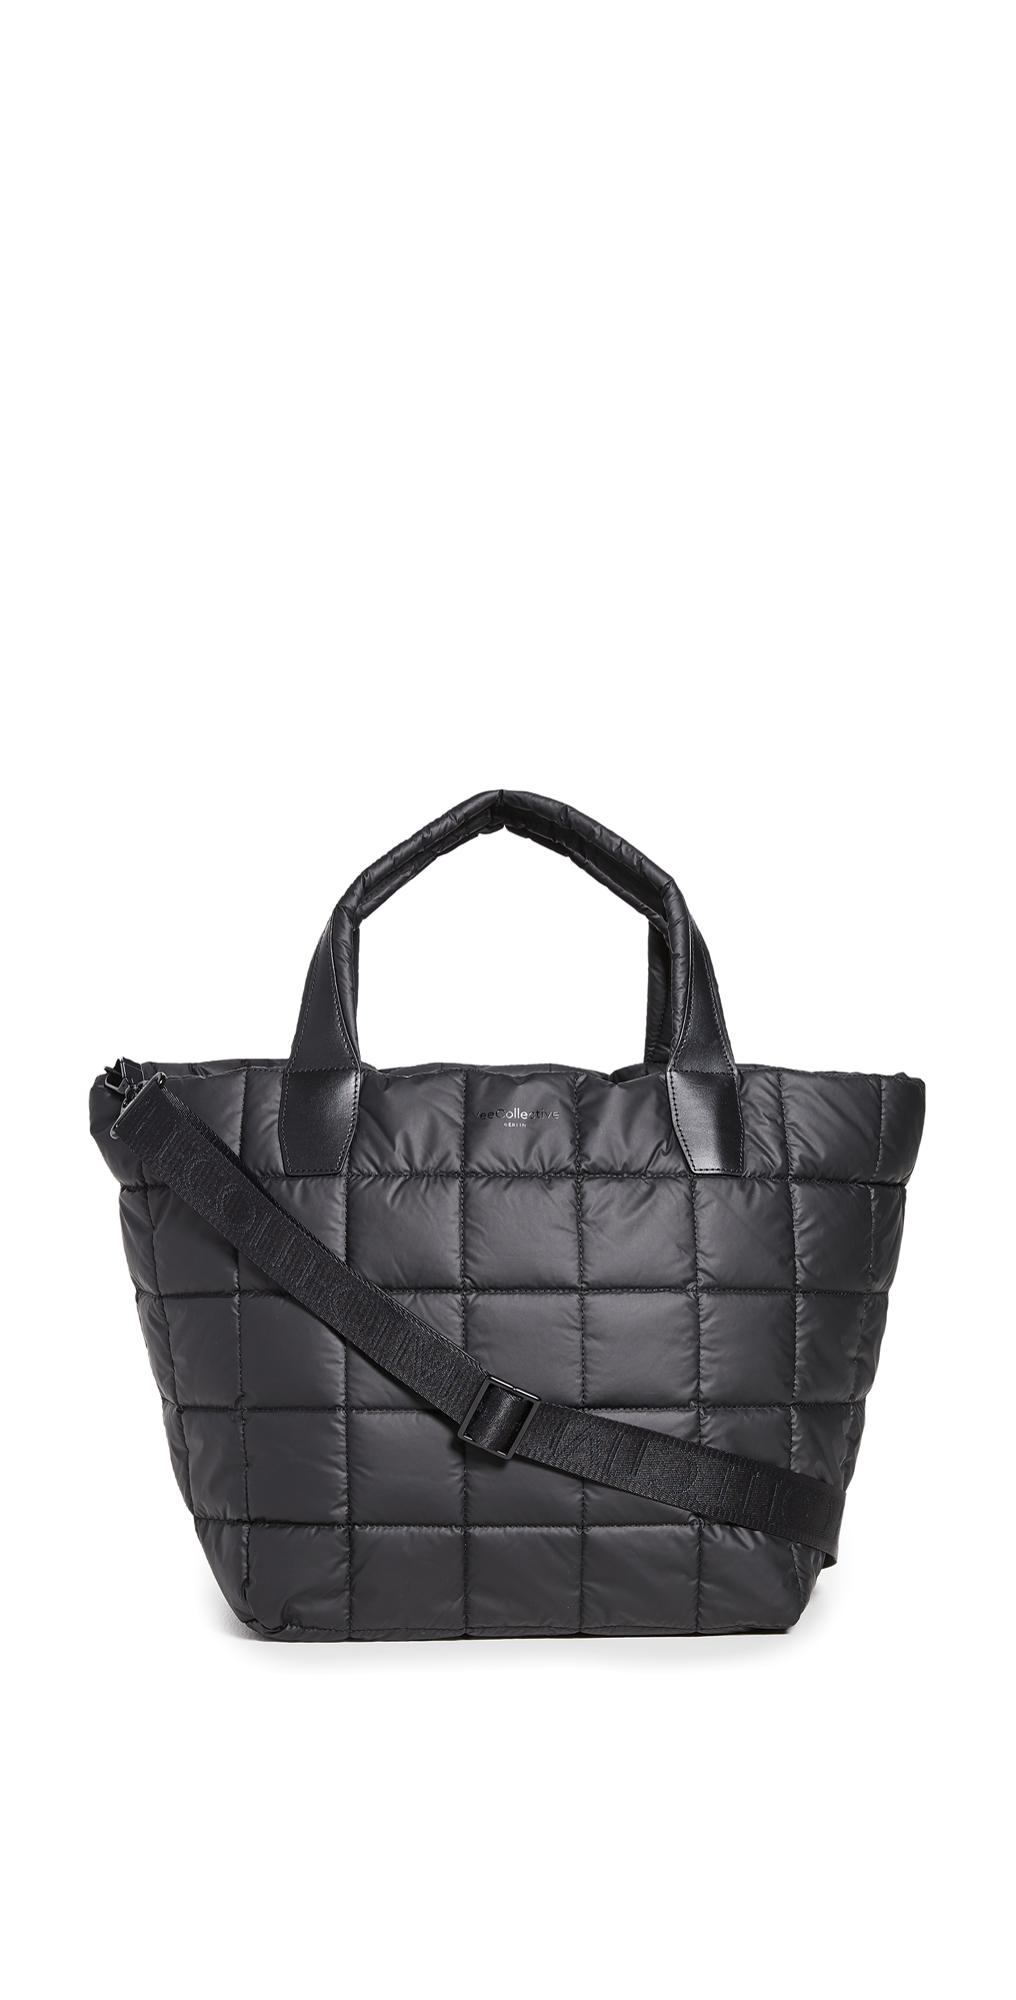 Vee Collective The Porter Medium Matt Black Bag